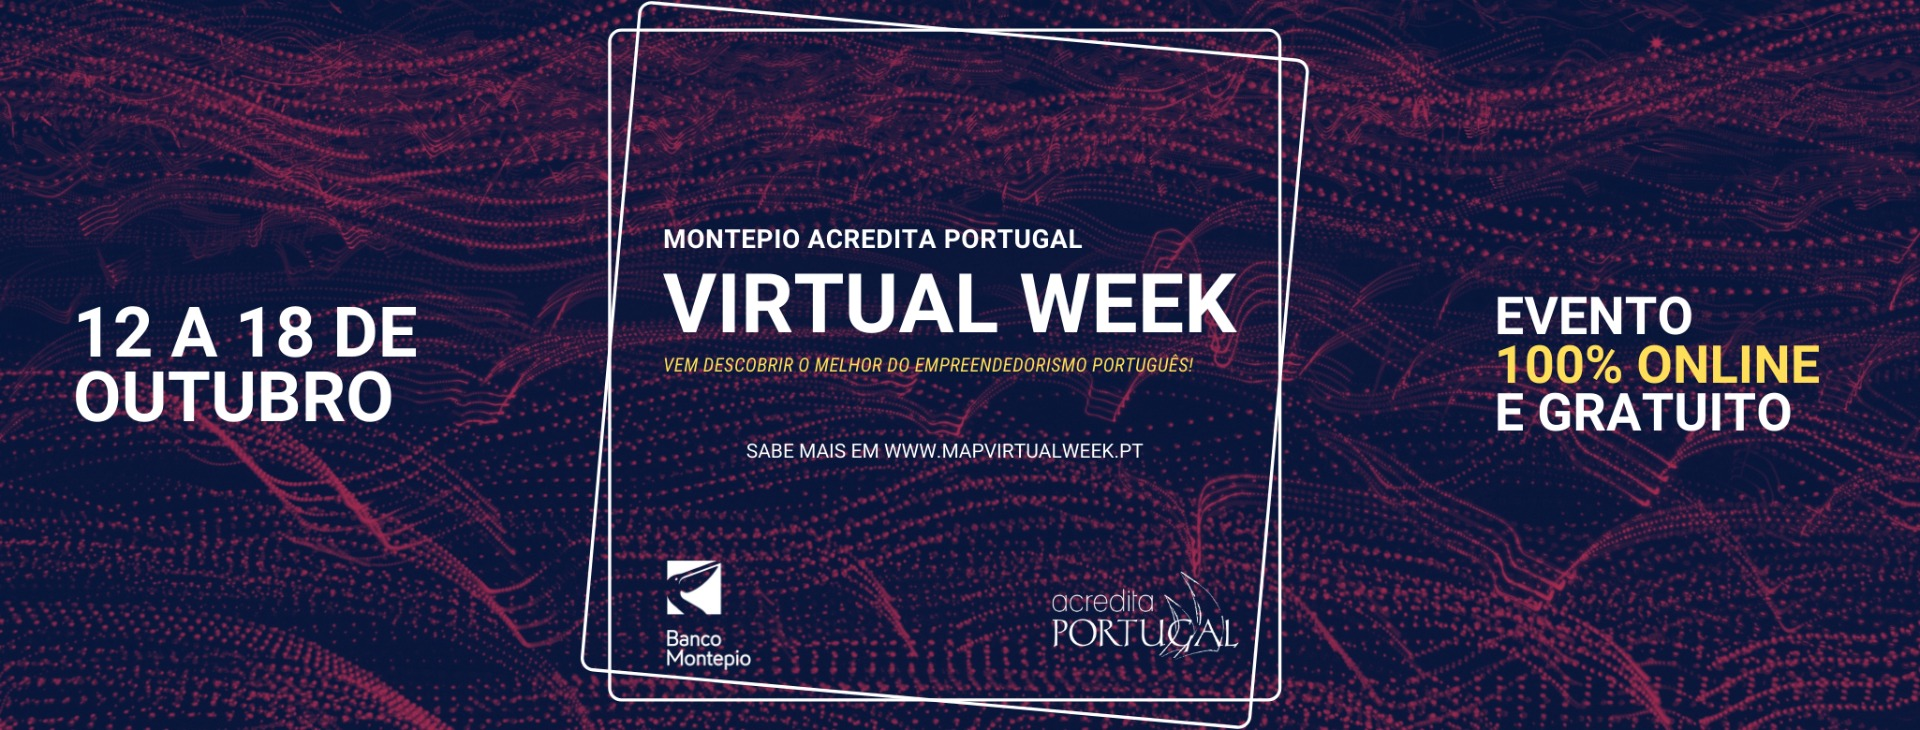 Banner Montepio Acredita Portugal